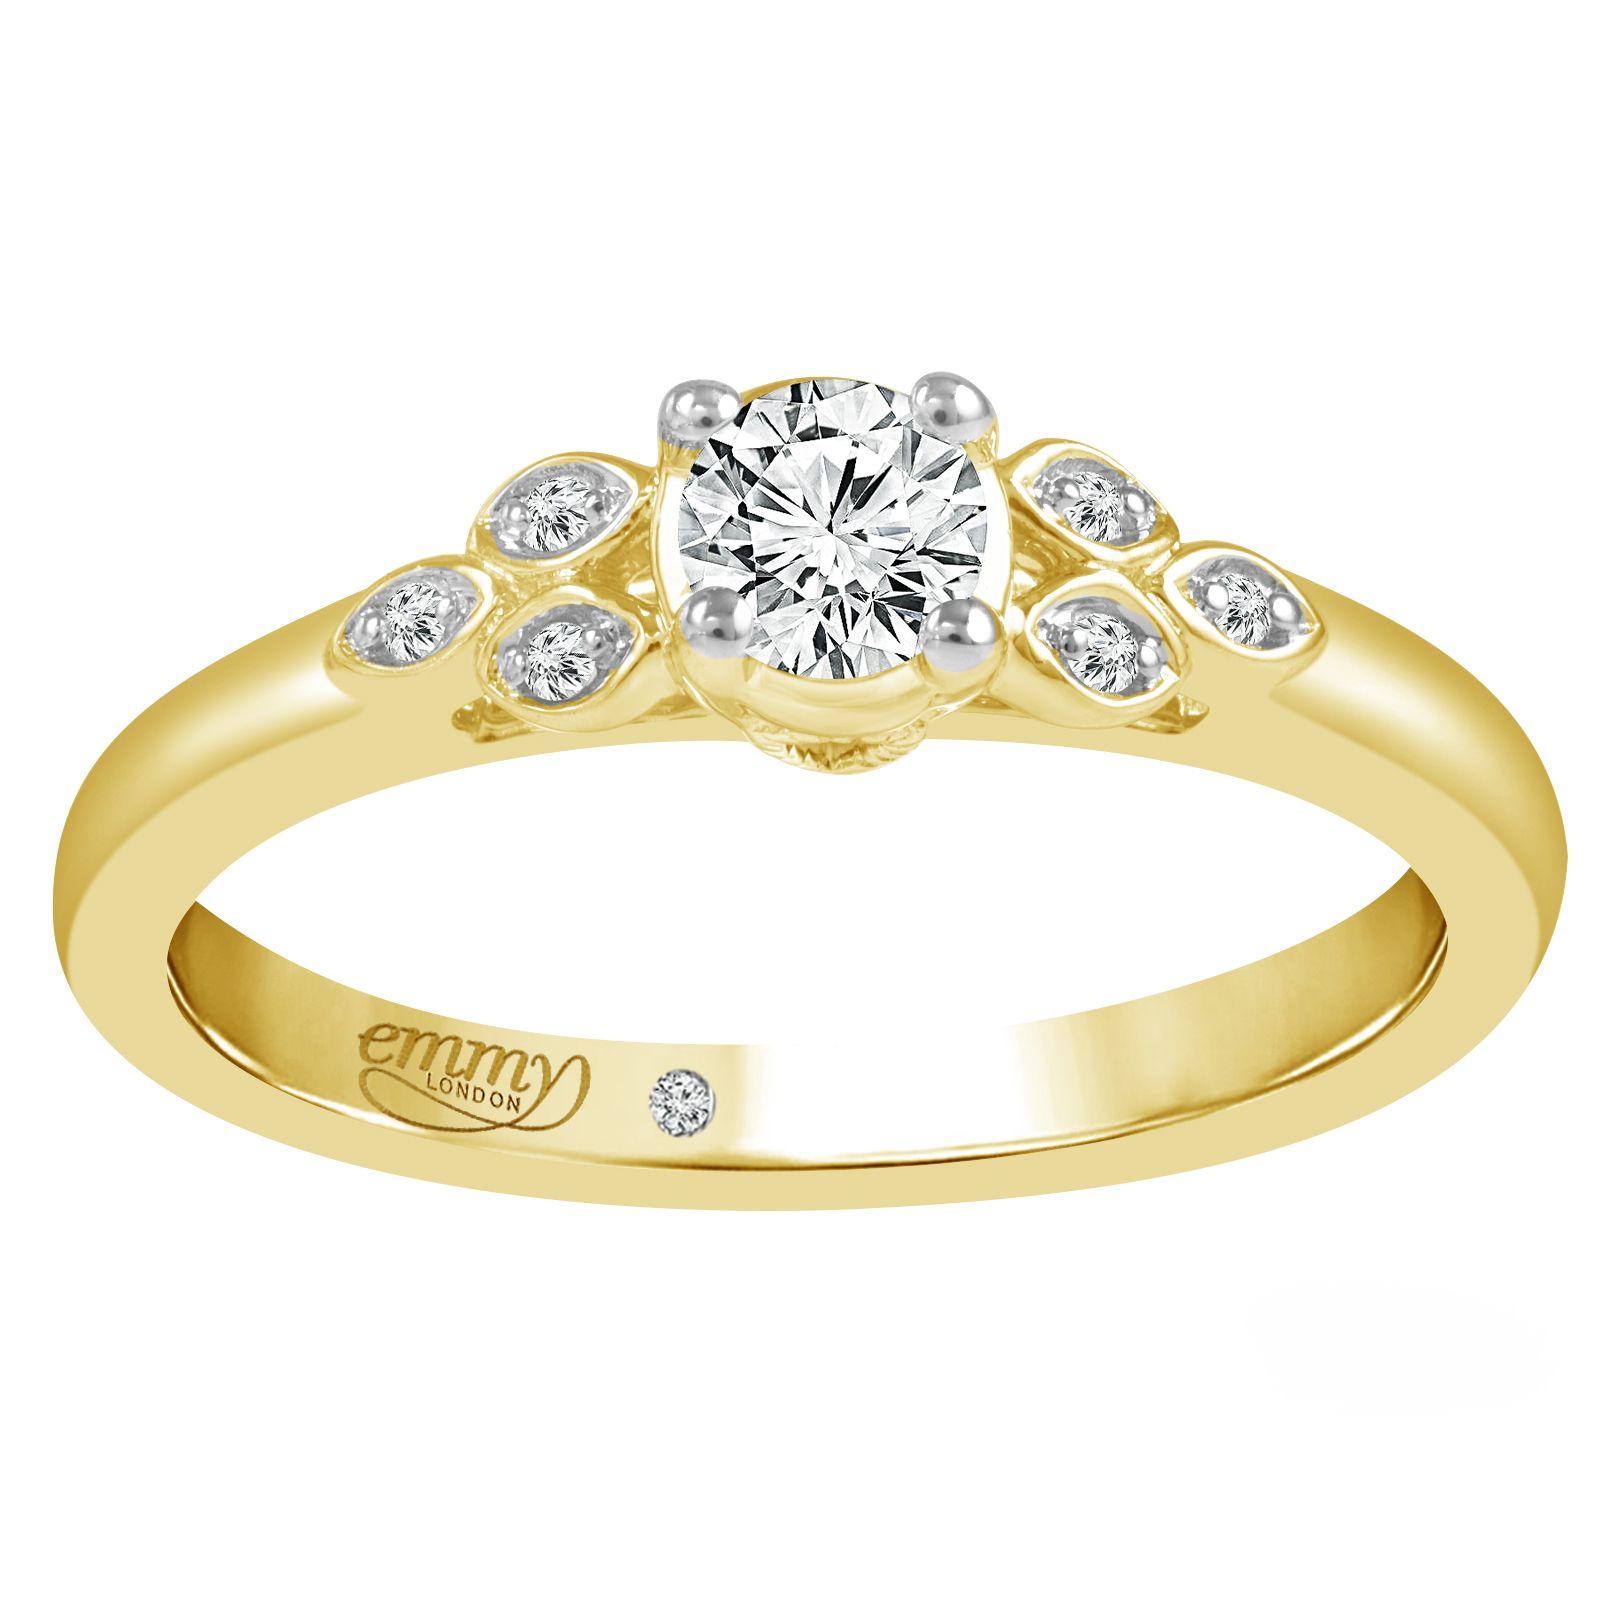 Emmy London 9ct Yellow Gold 1/5 Carat Diamond Ring 5